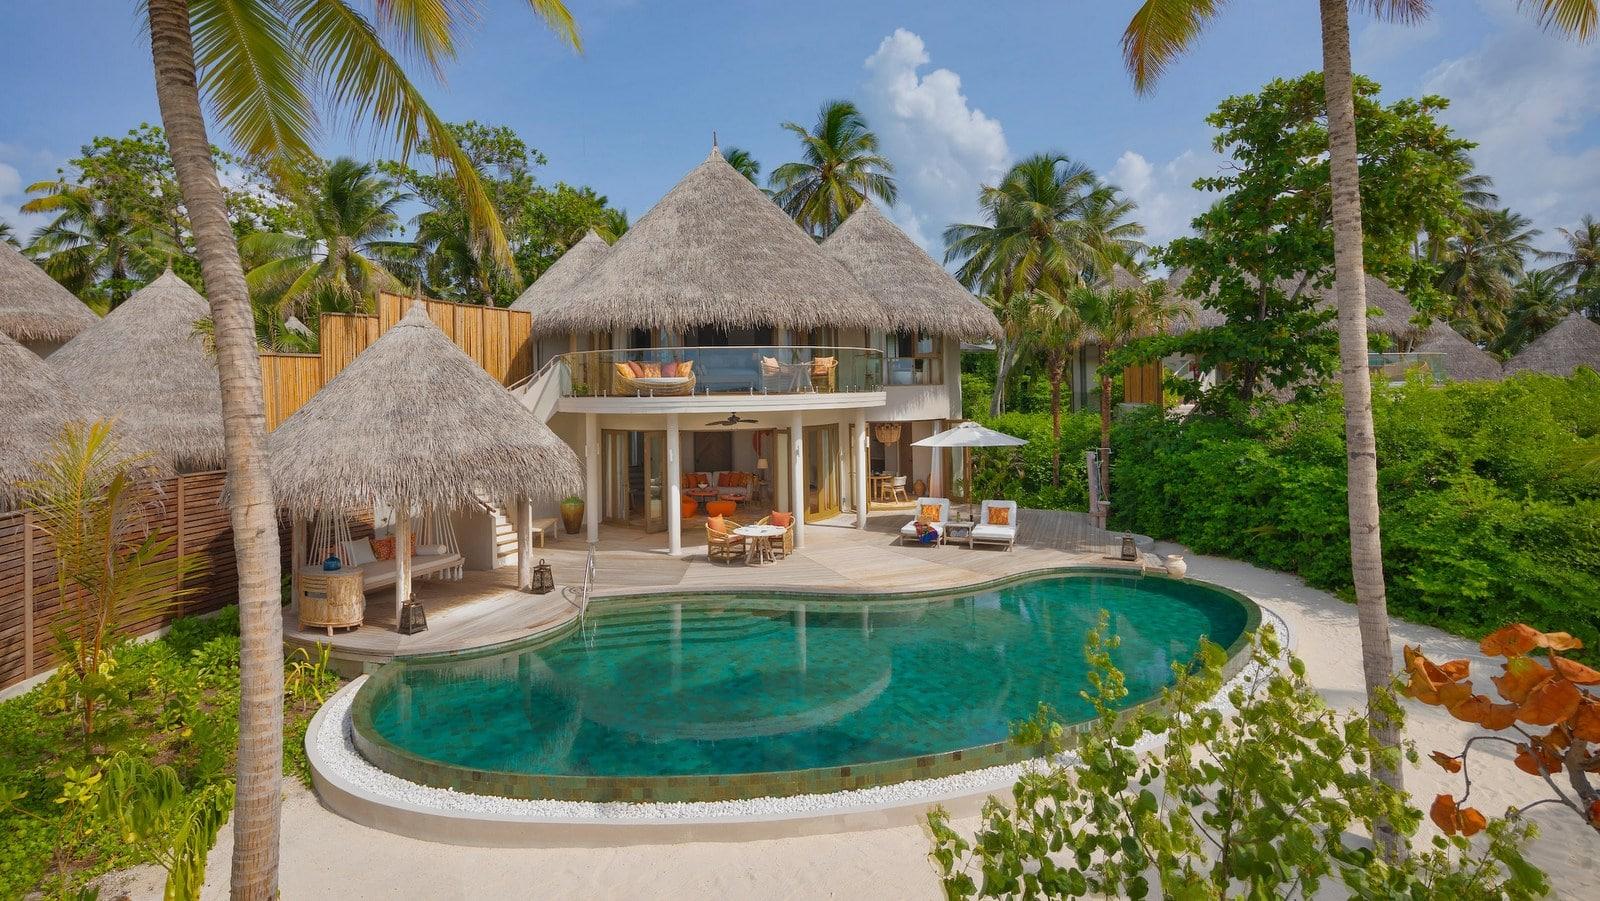 Мальдивы, отель The Nautilus Maldives, номер One-Bedroom Beach Residence